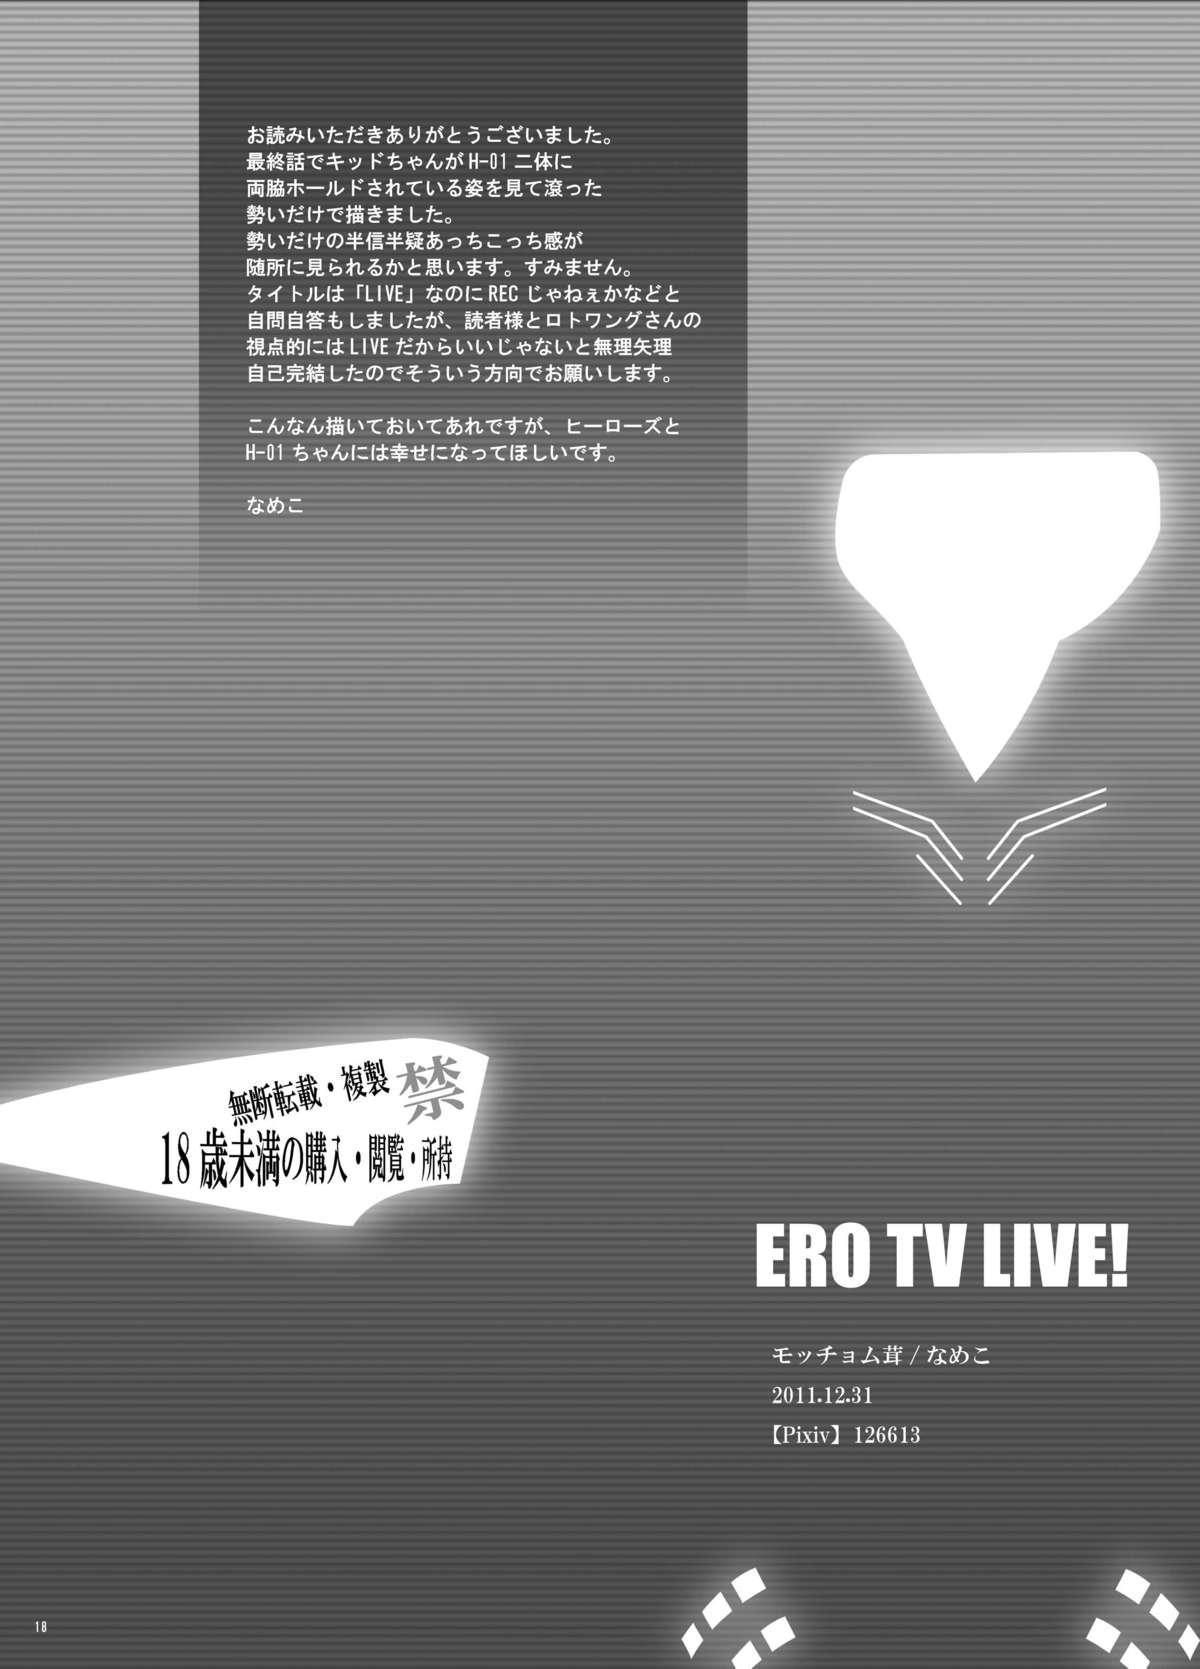 ERO TV LIVE! 16